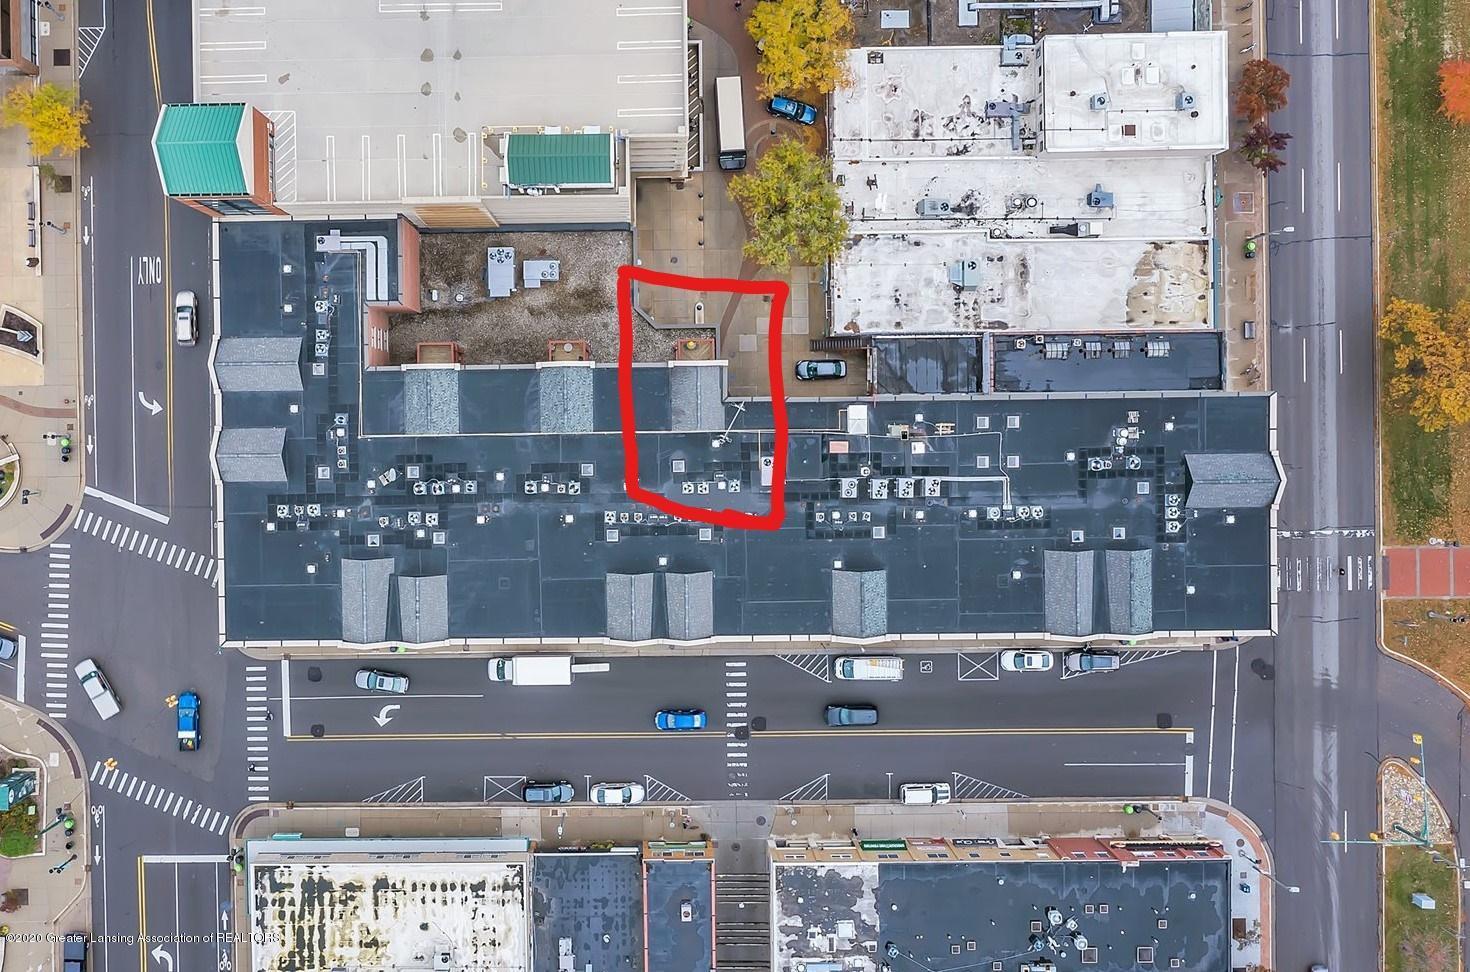 220 M. A. C. Ave Apt 409 - EXTERIOR Aerial View - 38